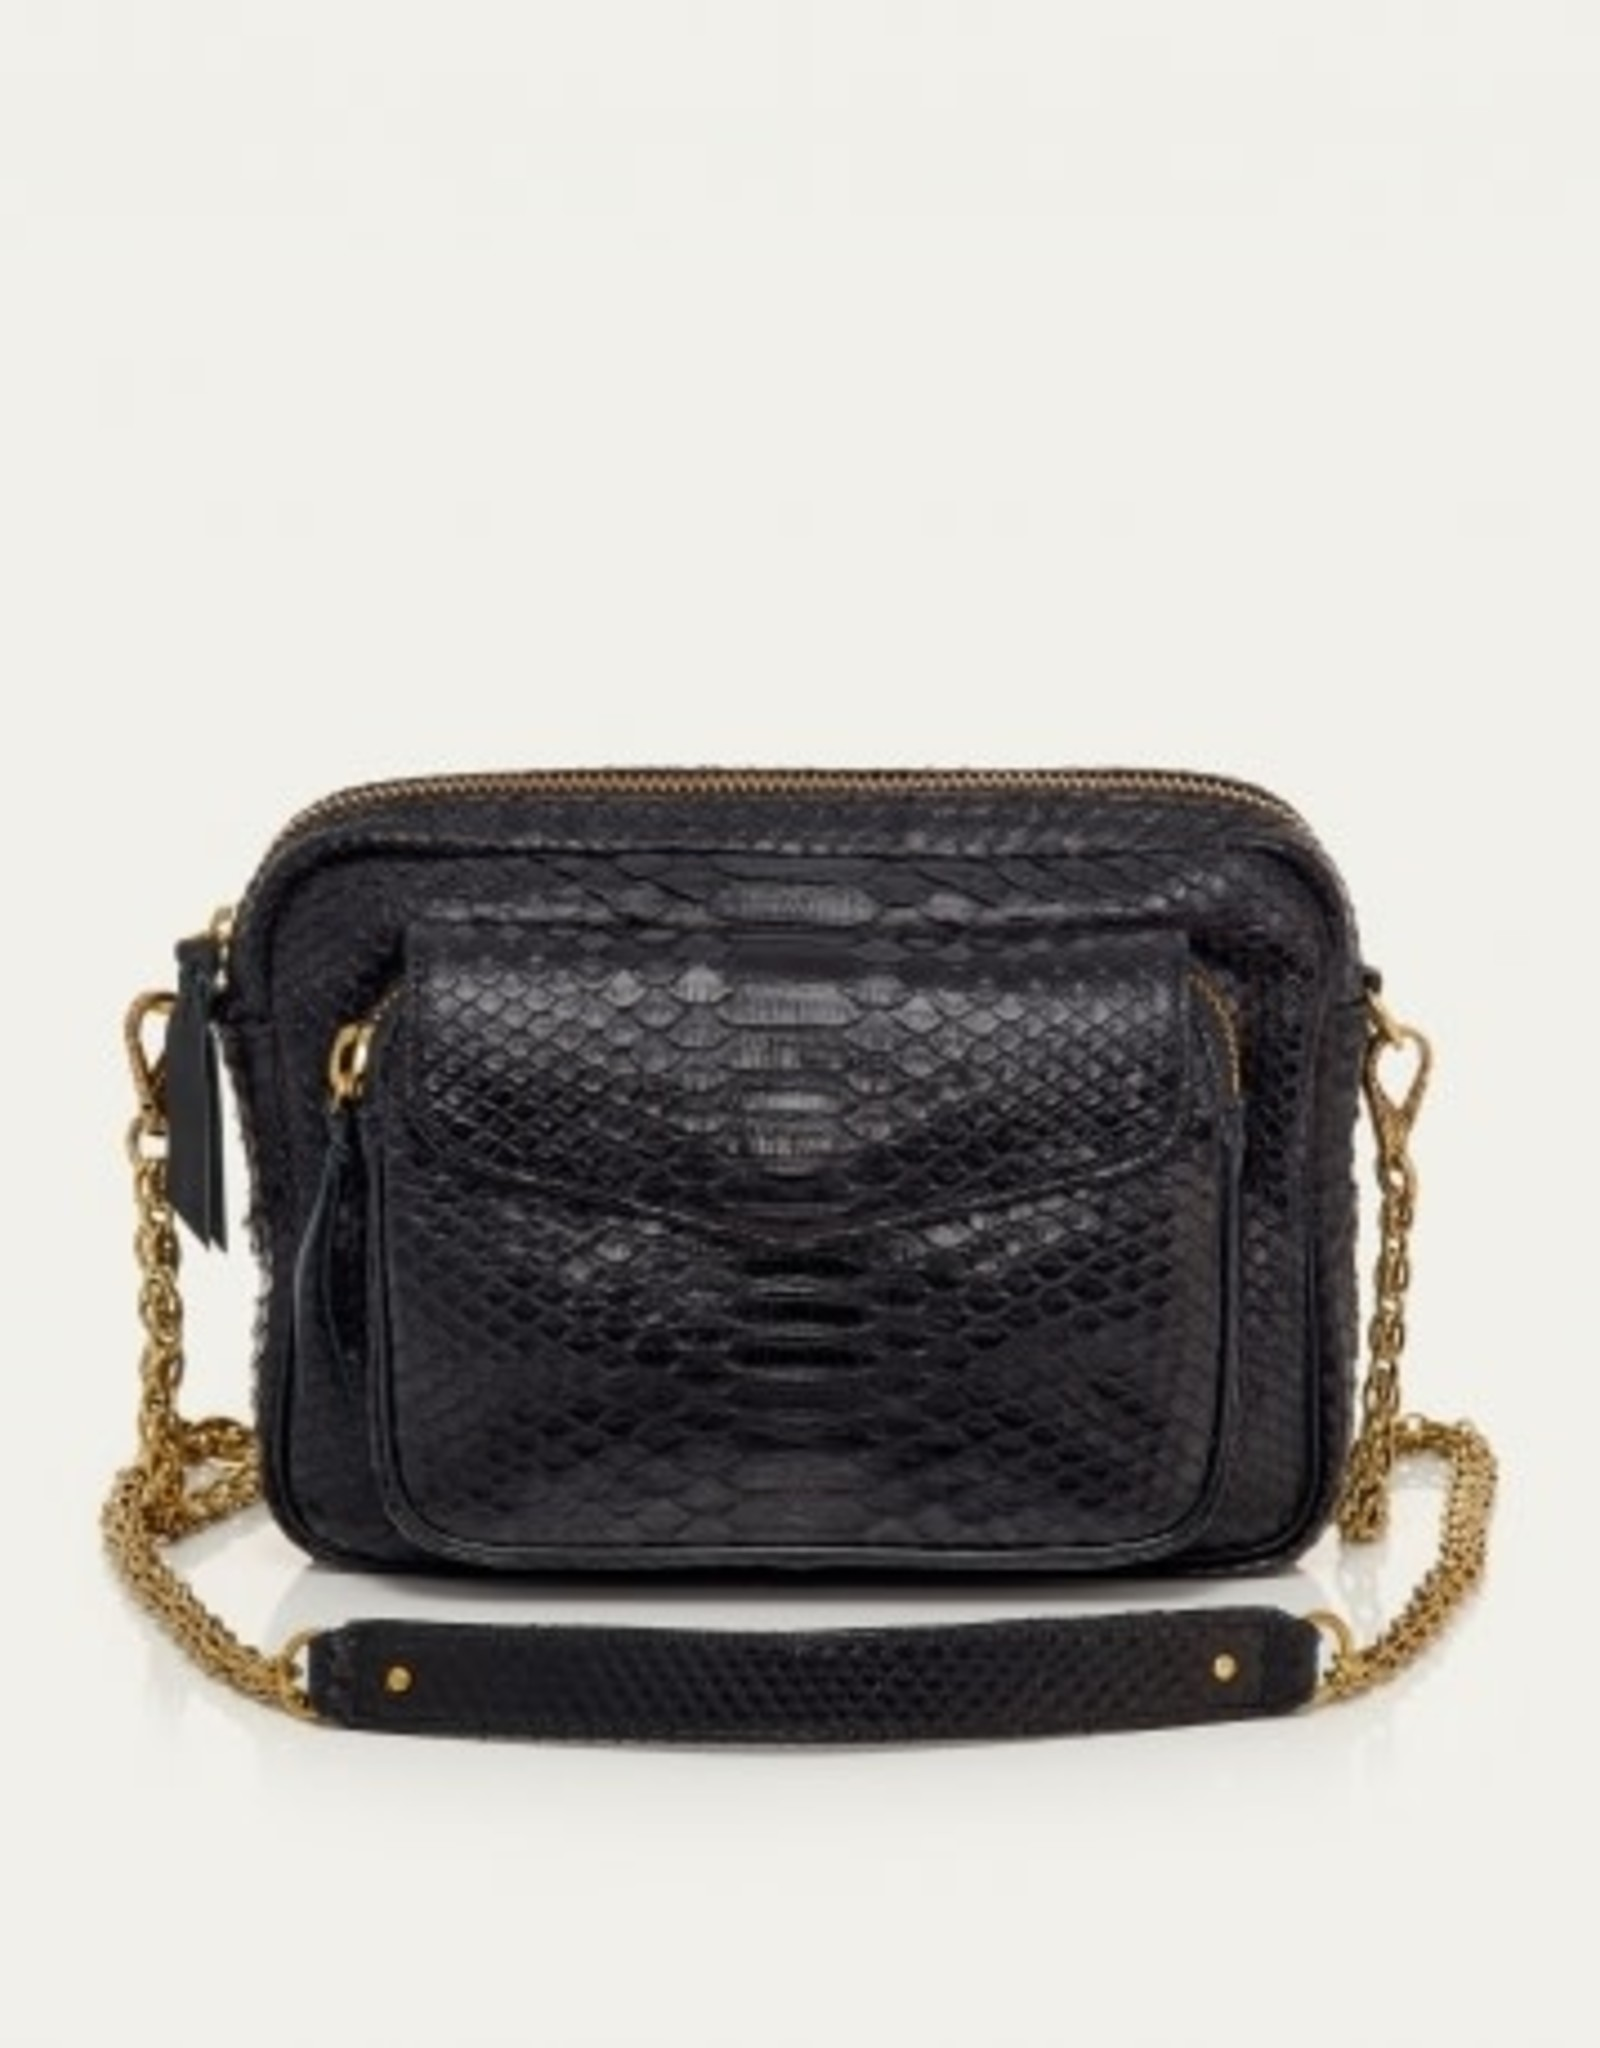 Claris Virot Big Charly Bag